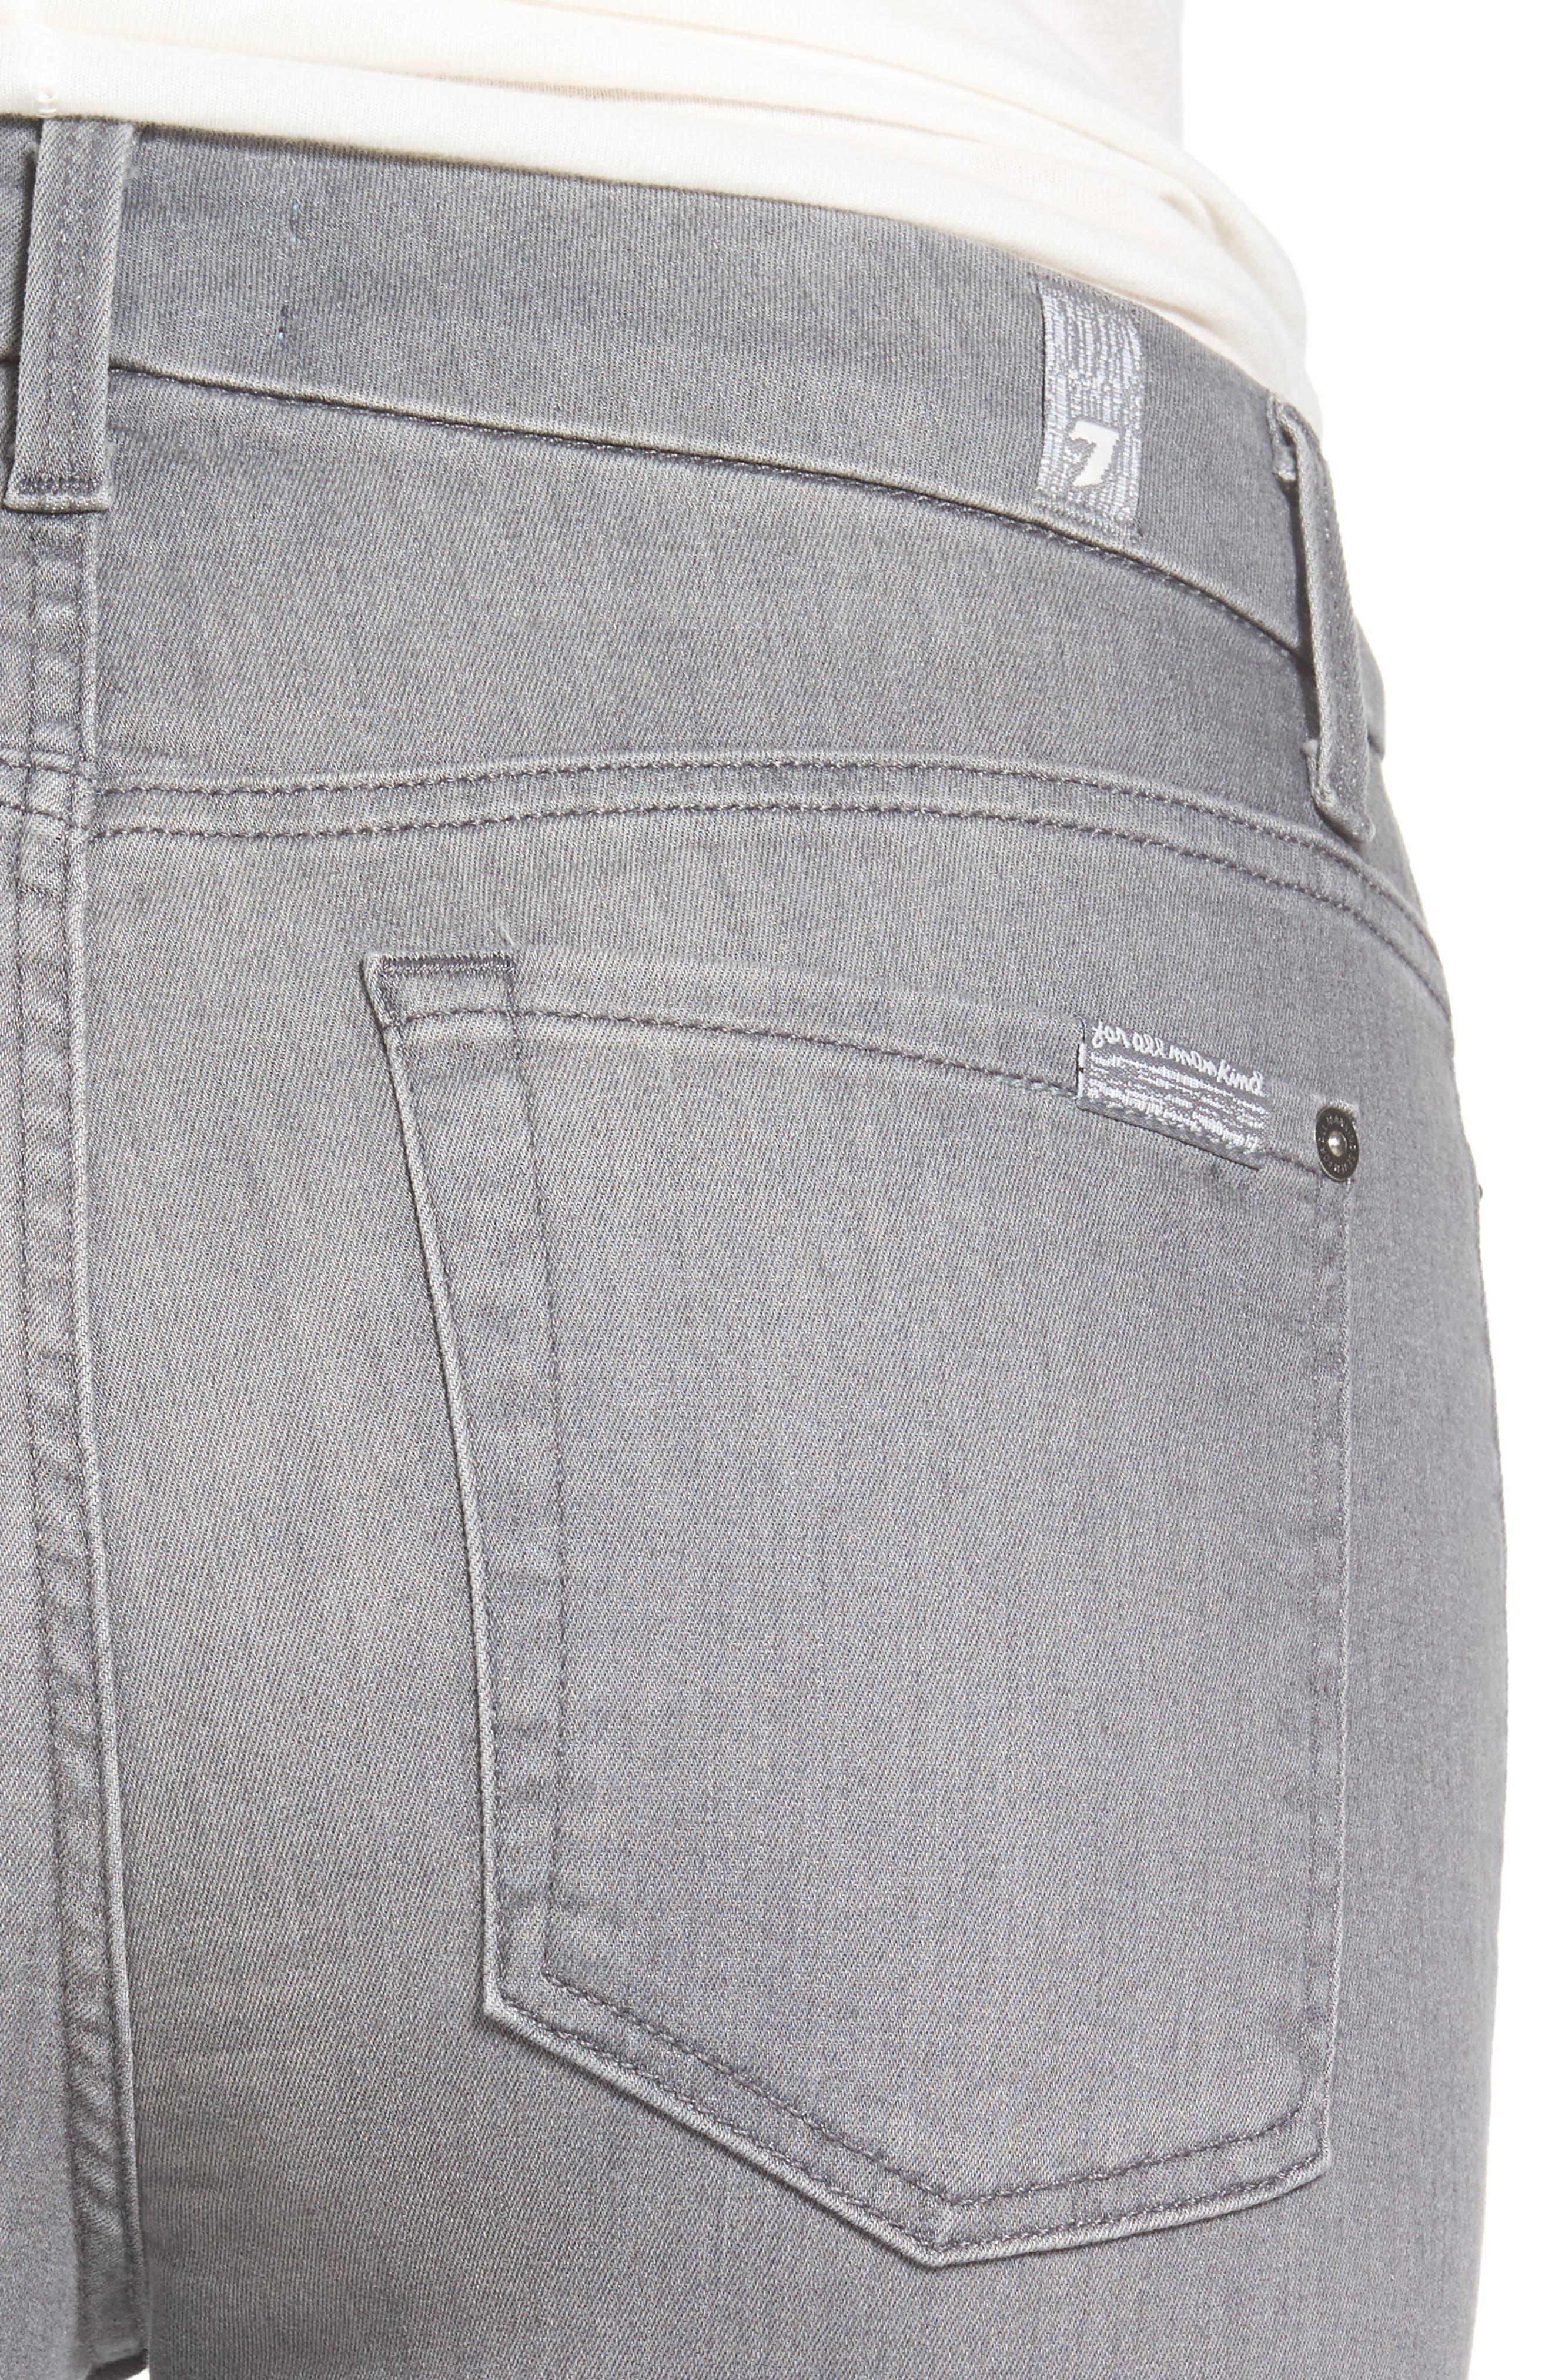 b(air) High Waist Skinny Jeans,                             Alternate thumbnail 4, color,                             B(Air) Chrysler Grey- Bac2